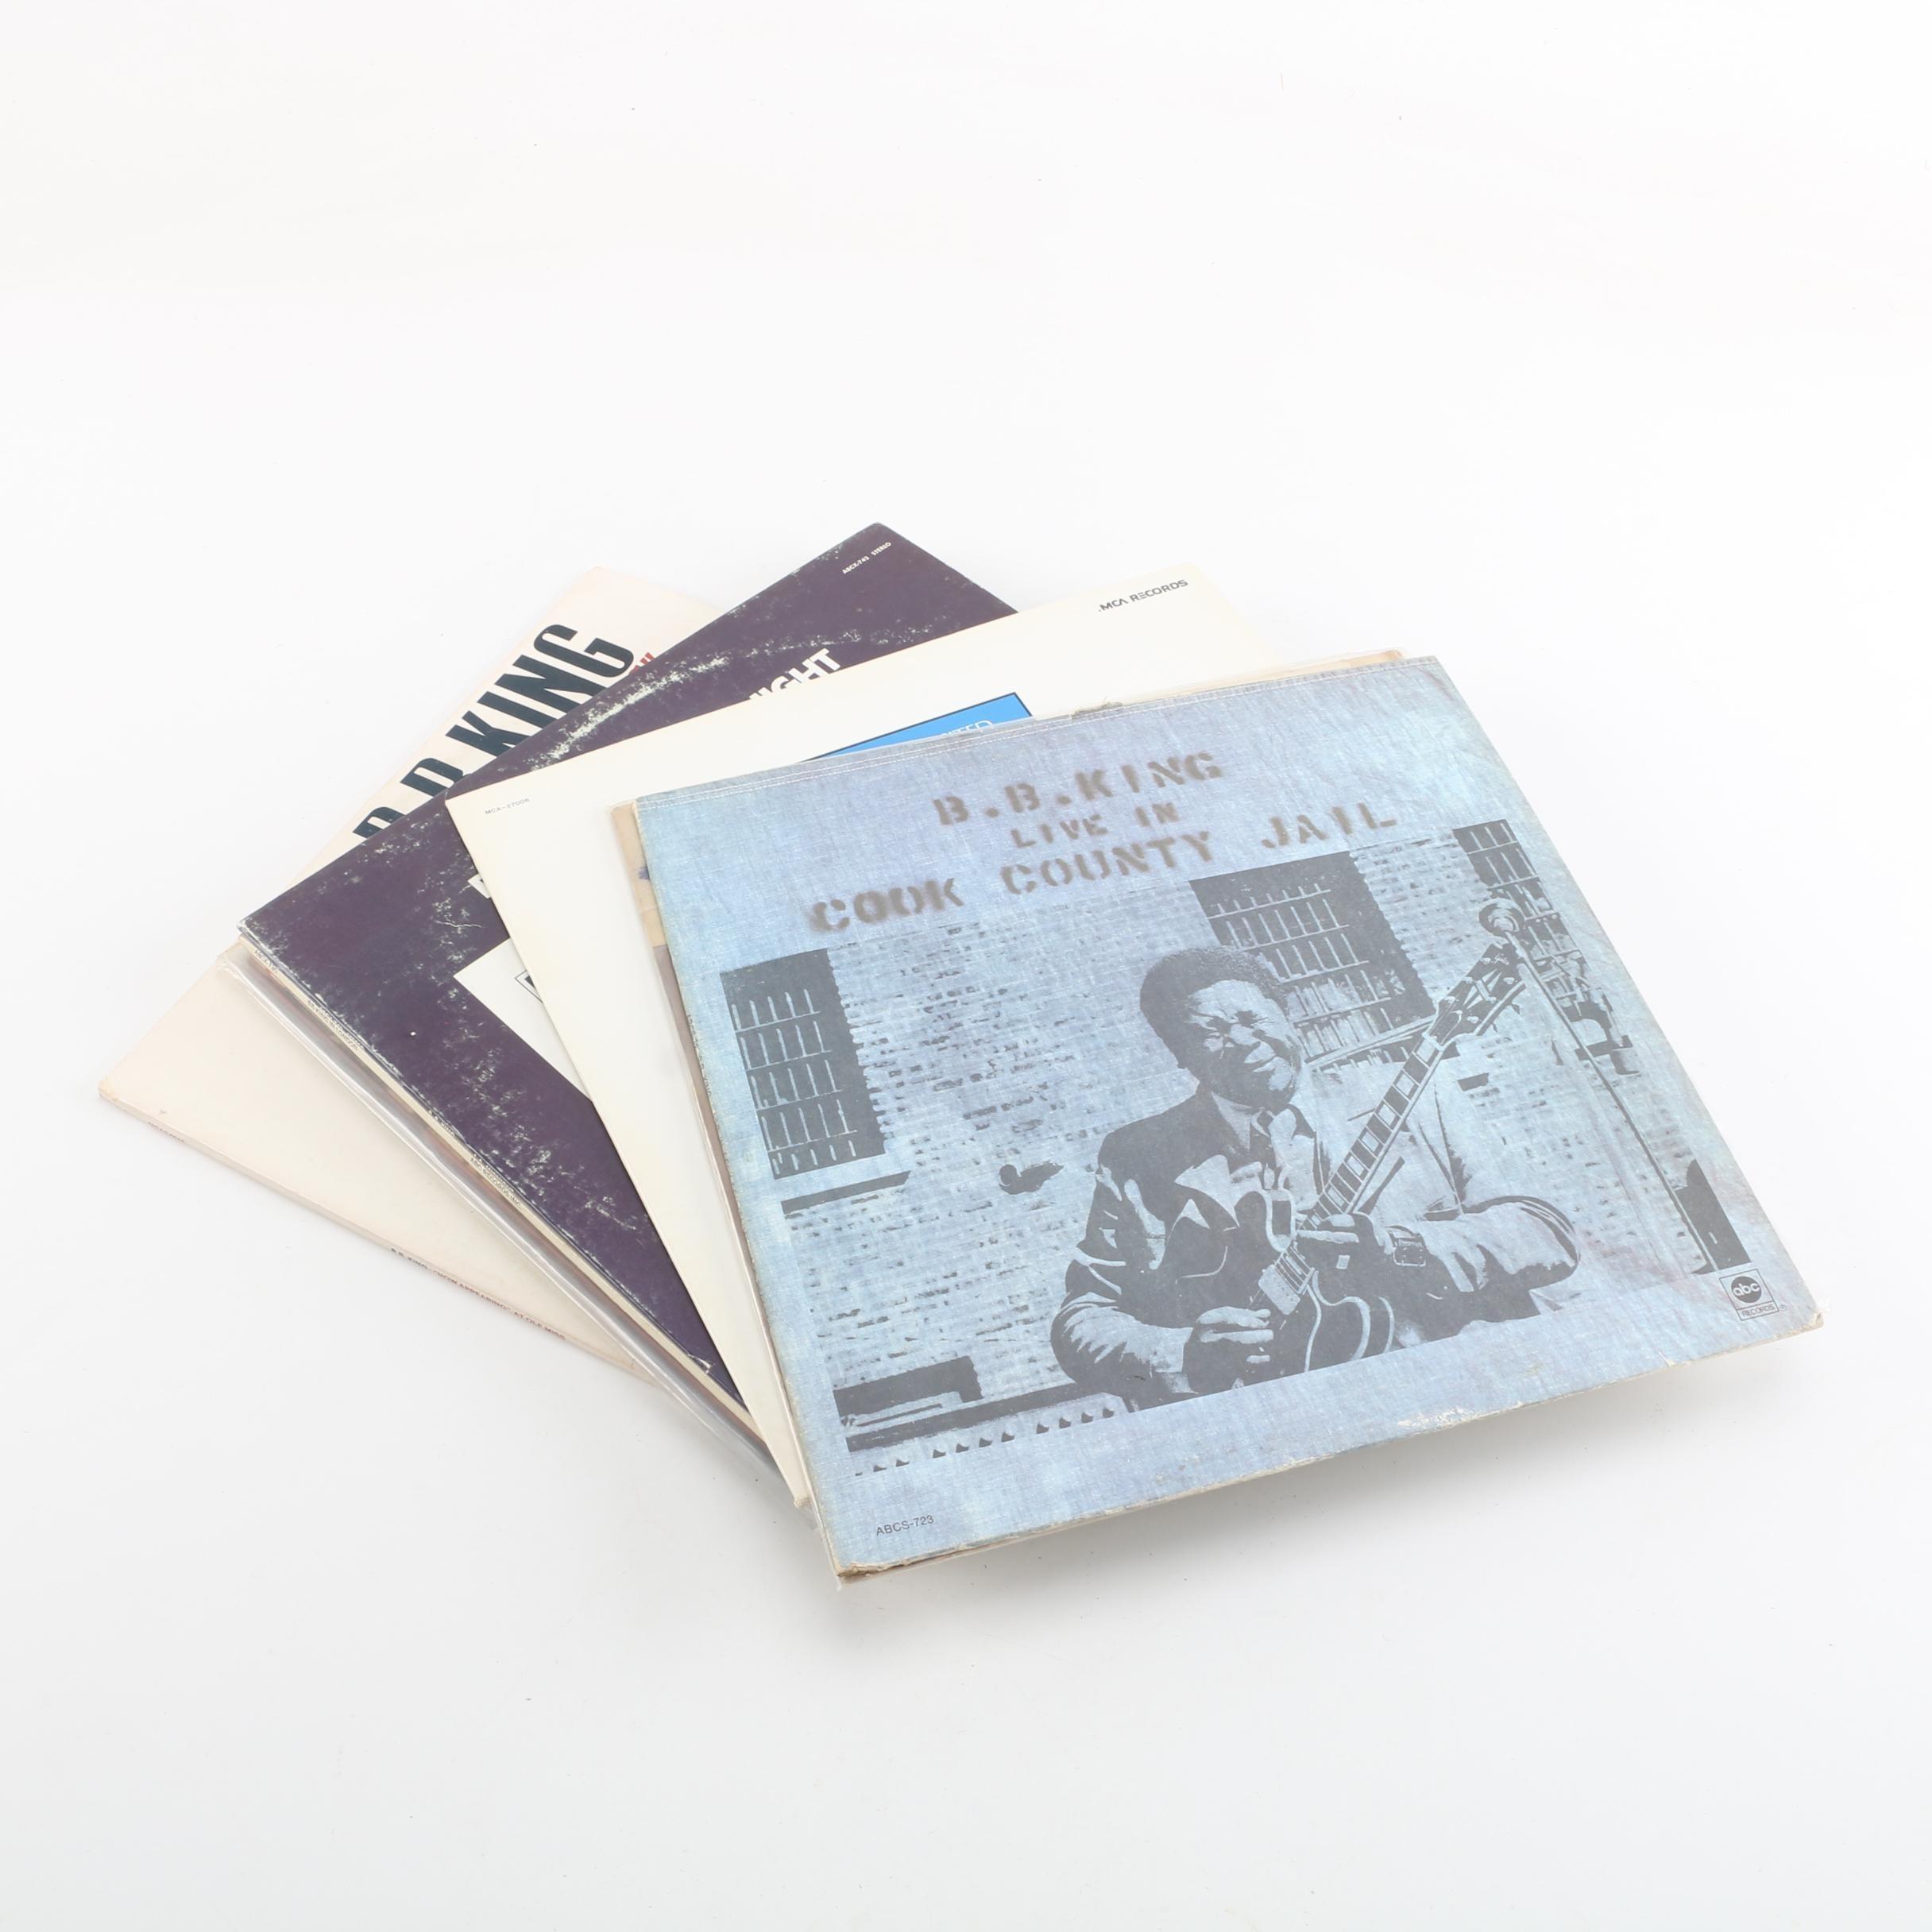 B.B. King Records